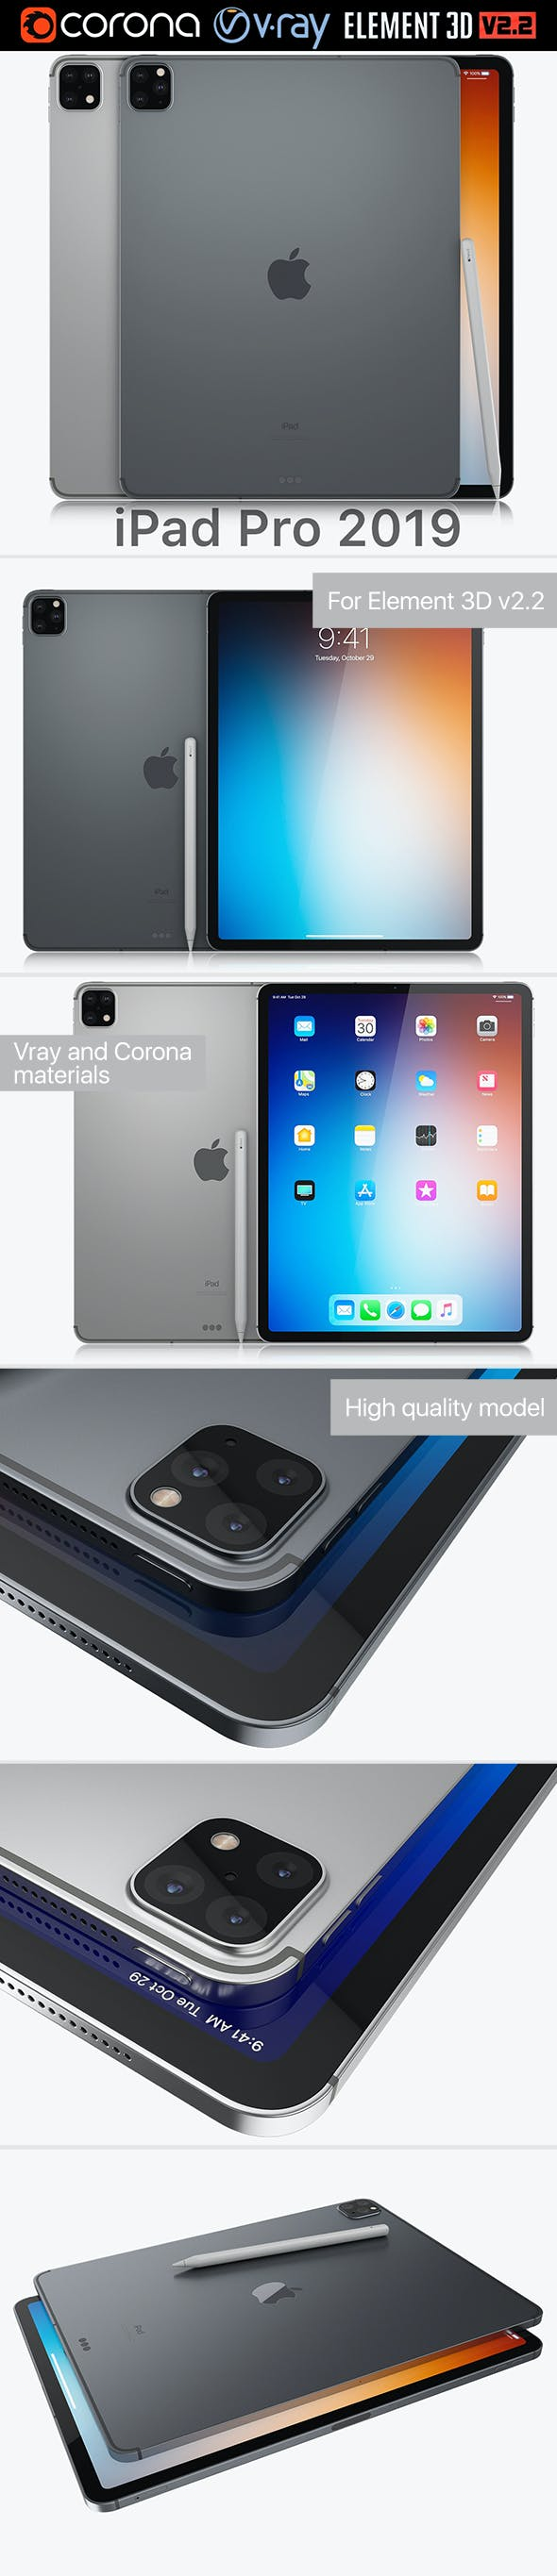 Apple iPad Pro 2019 - 3DOcean Item for Sale